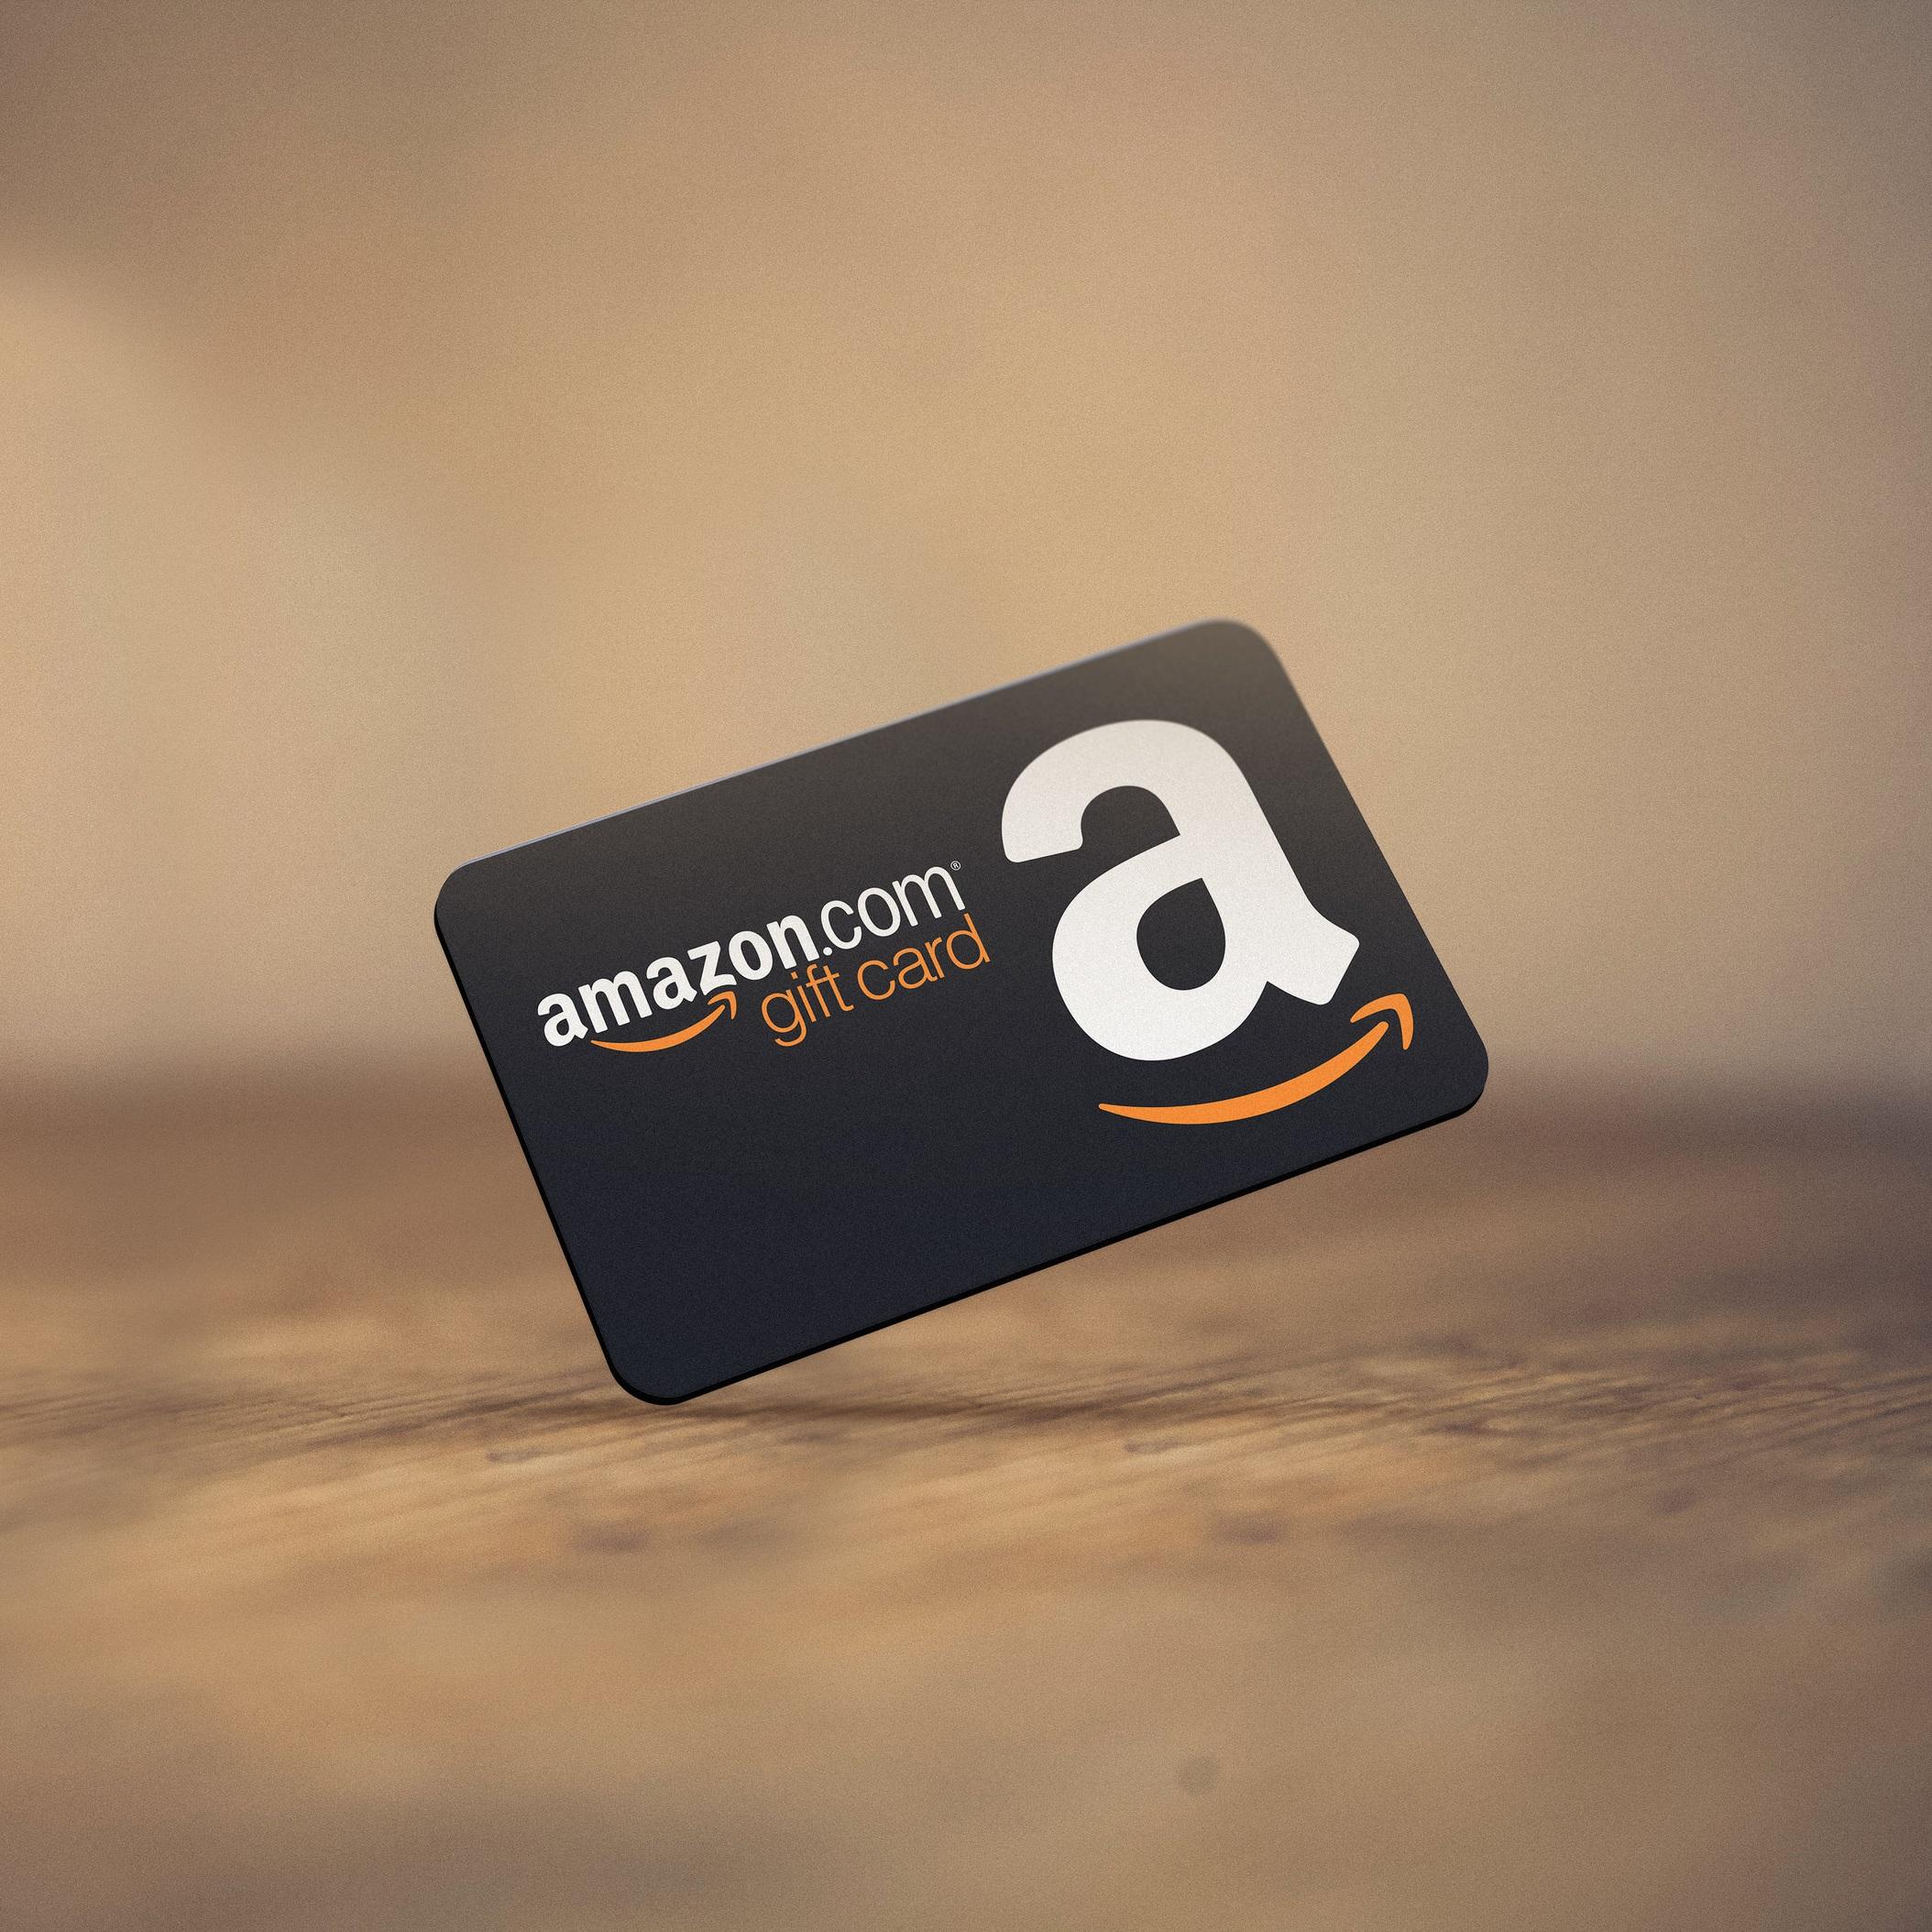 Amazon Gift Cards ($20-$300)